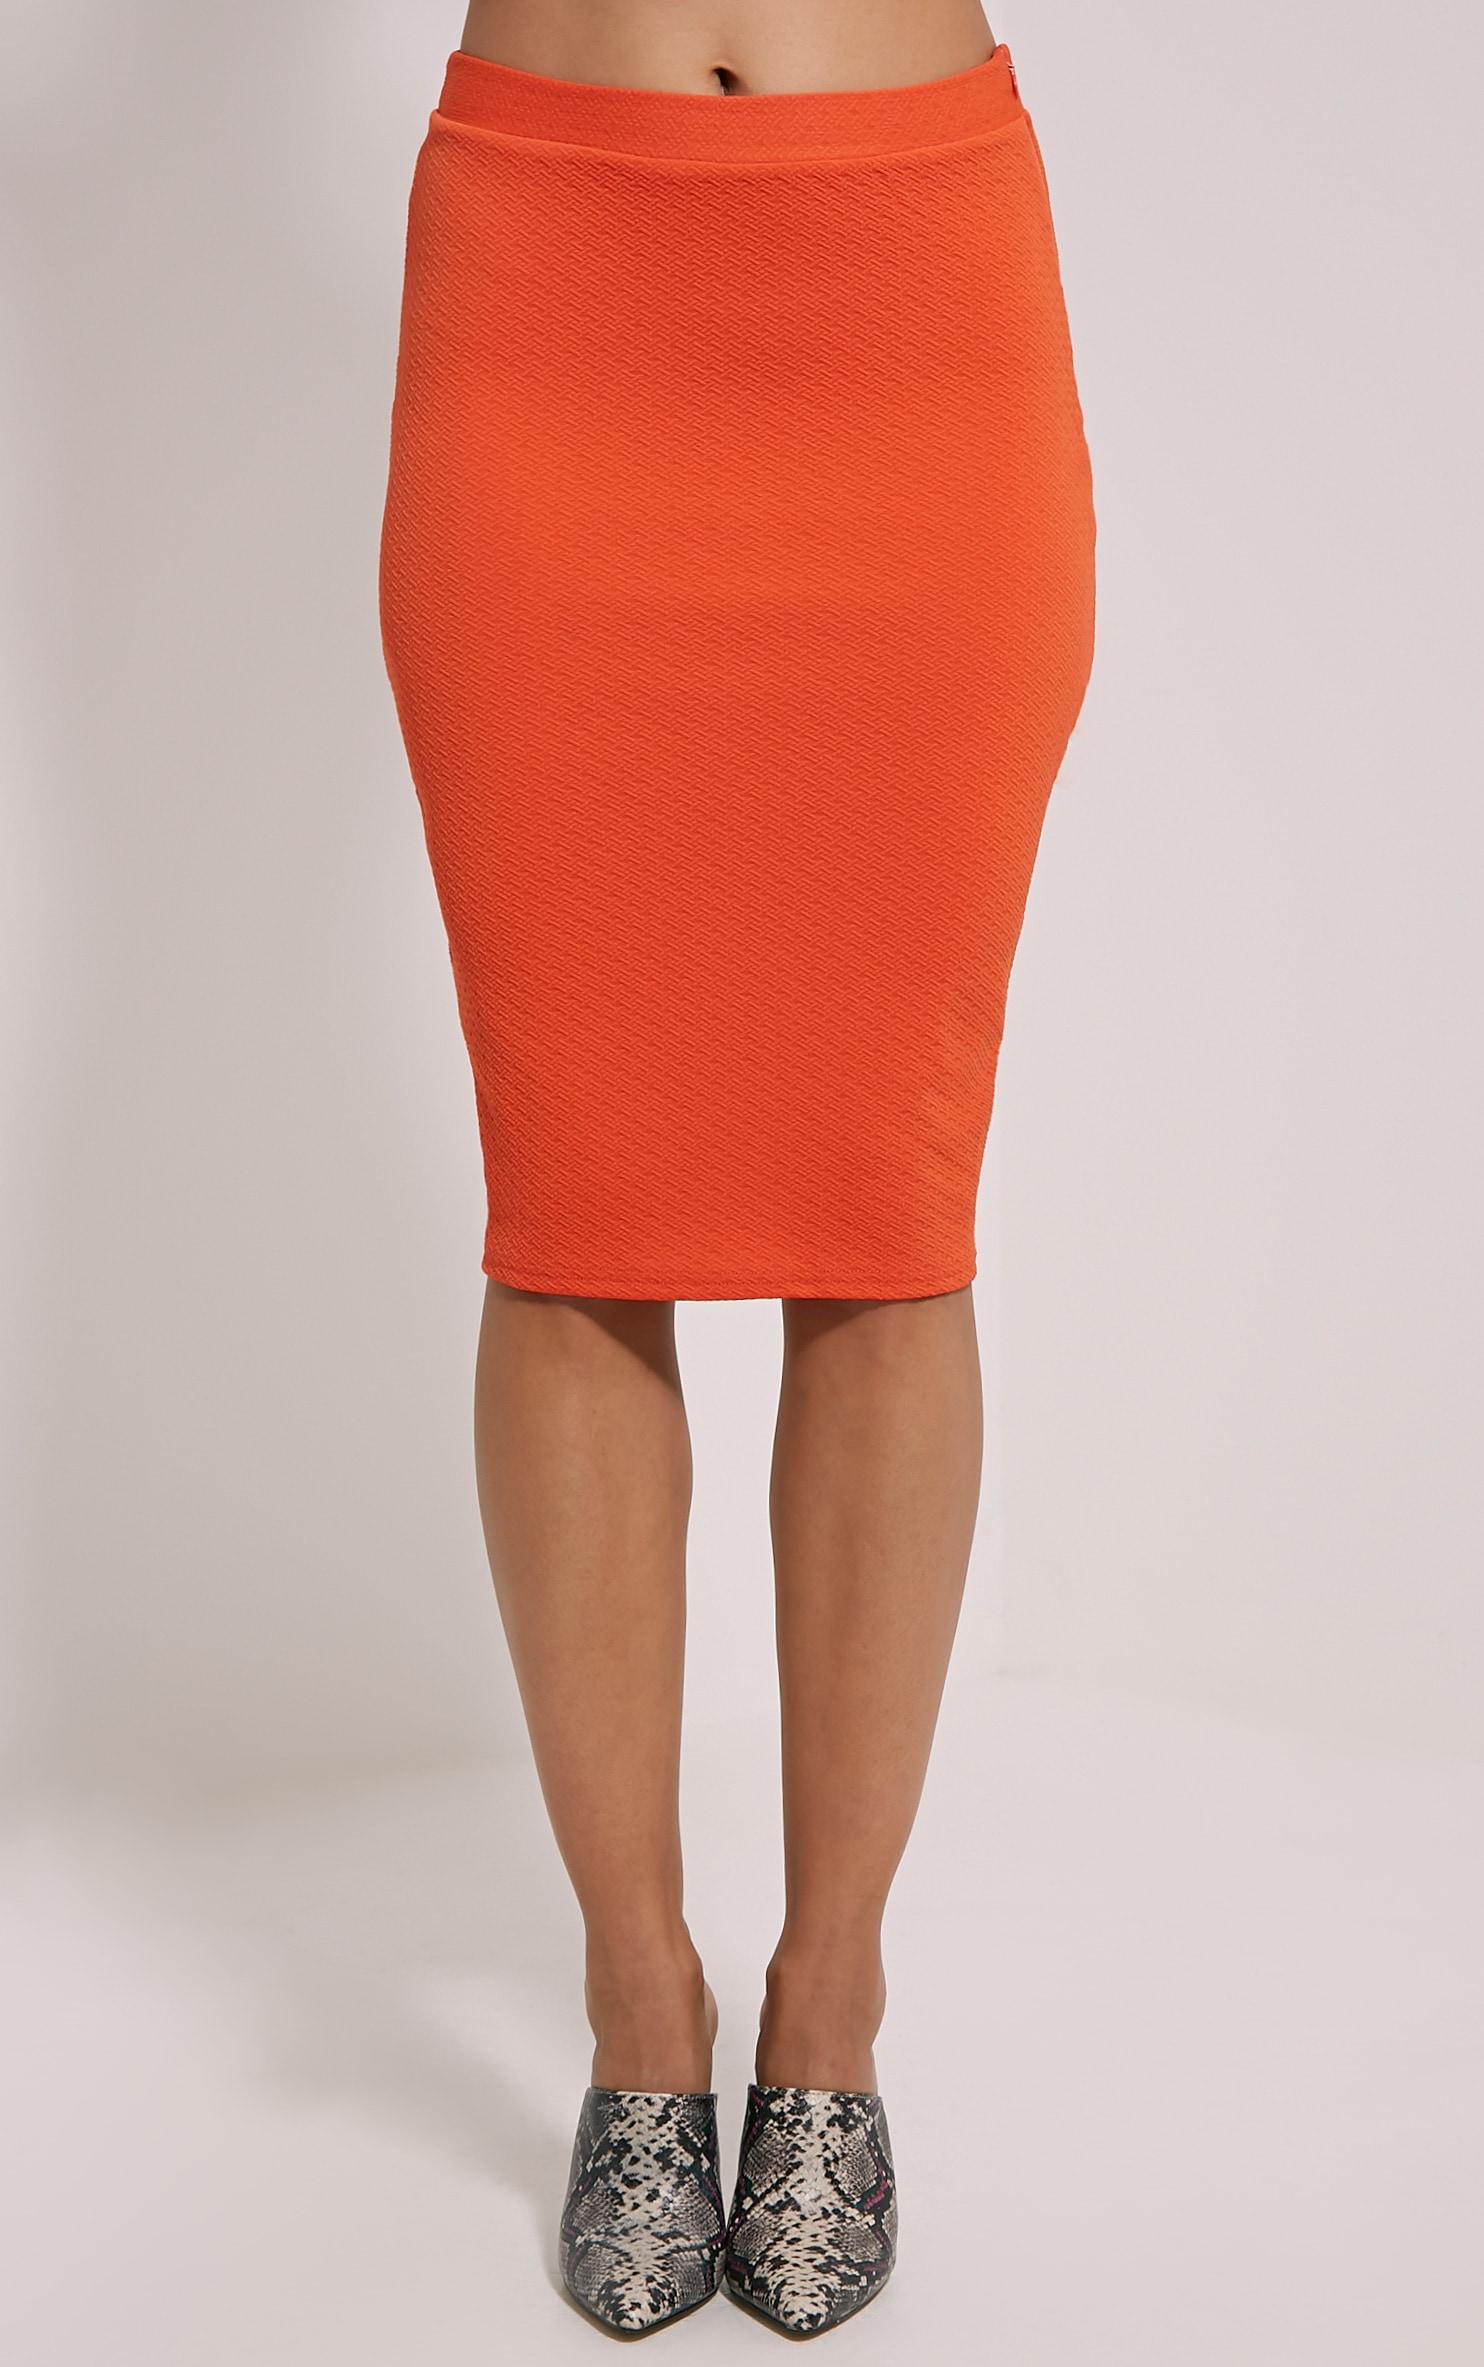 Beulah Orange Textured Midi Skirt 2